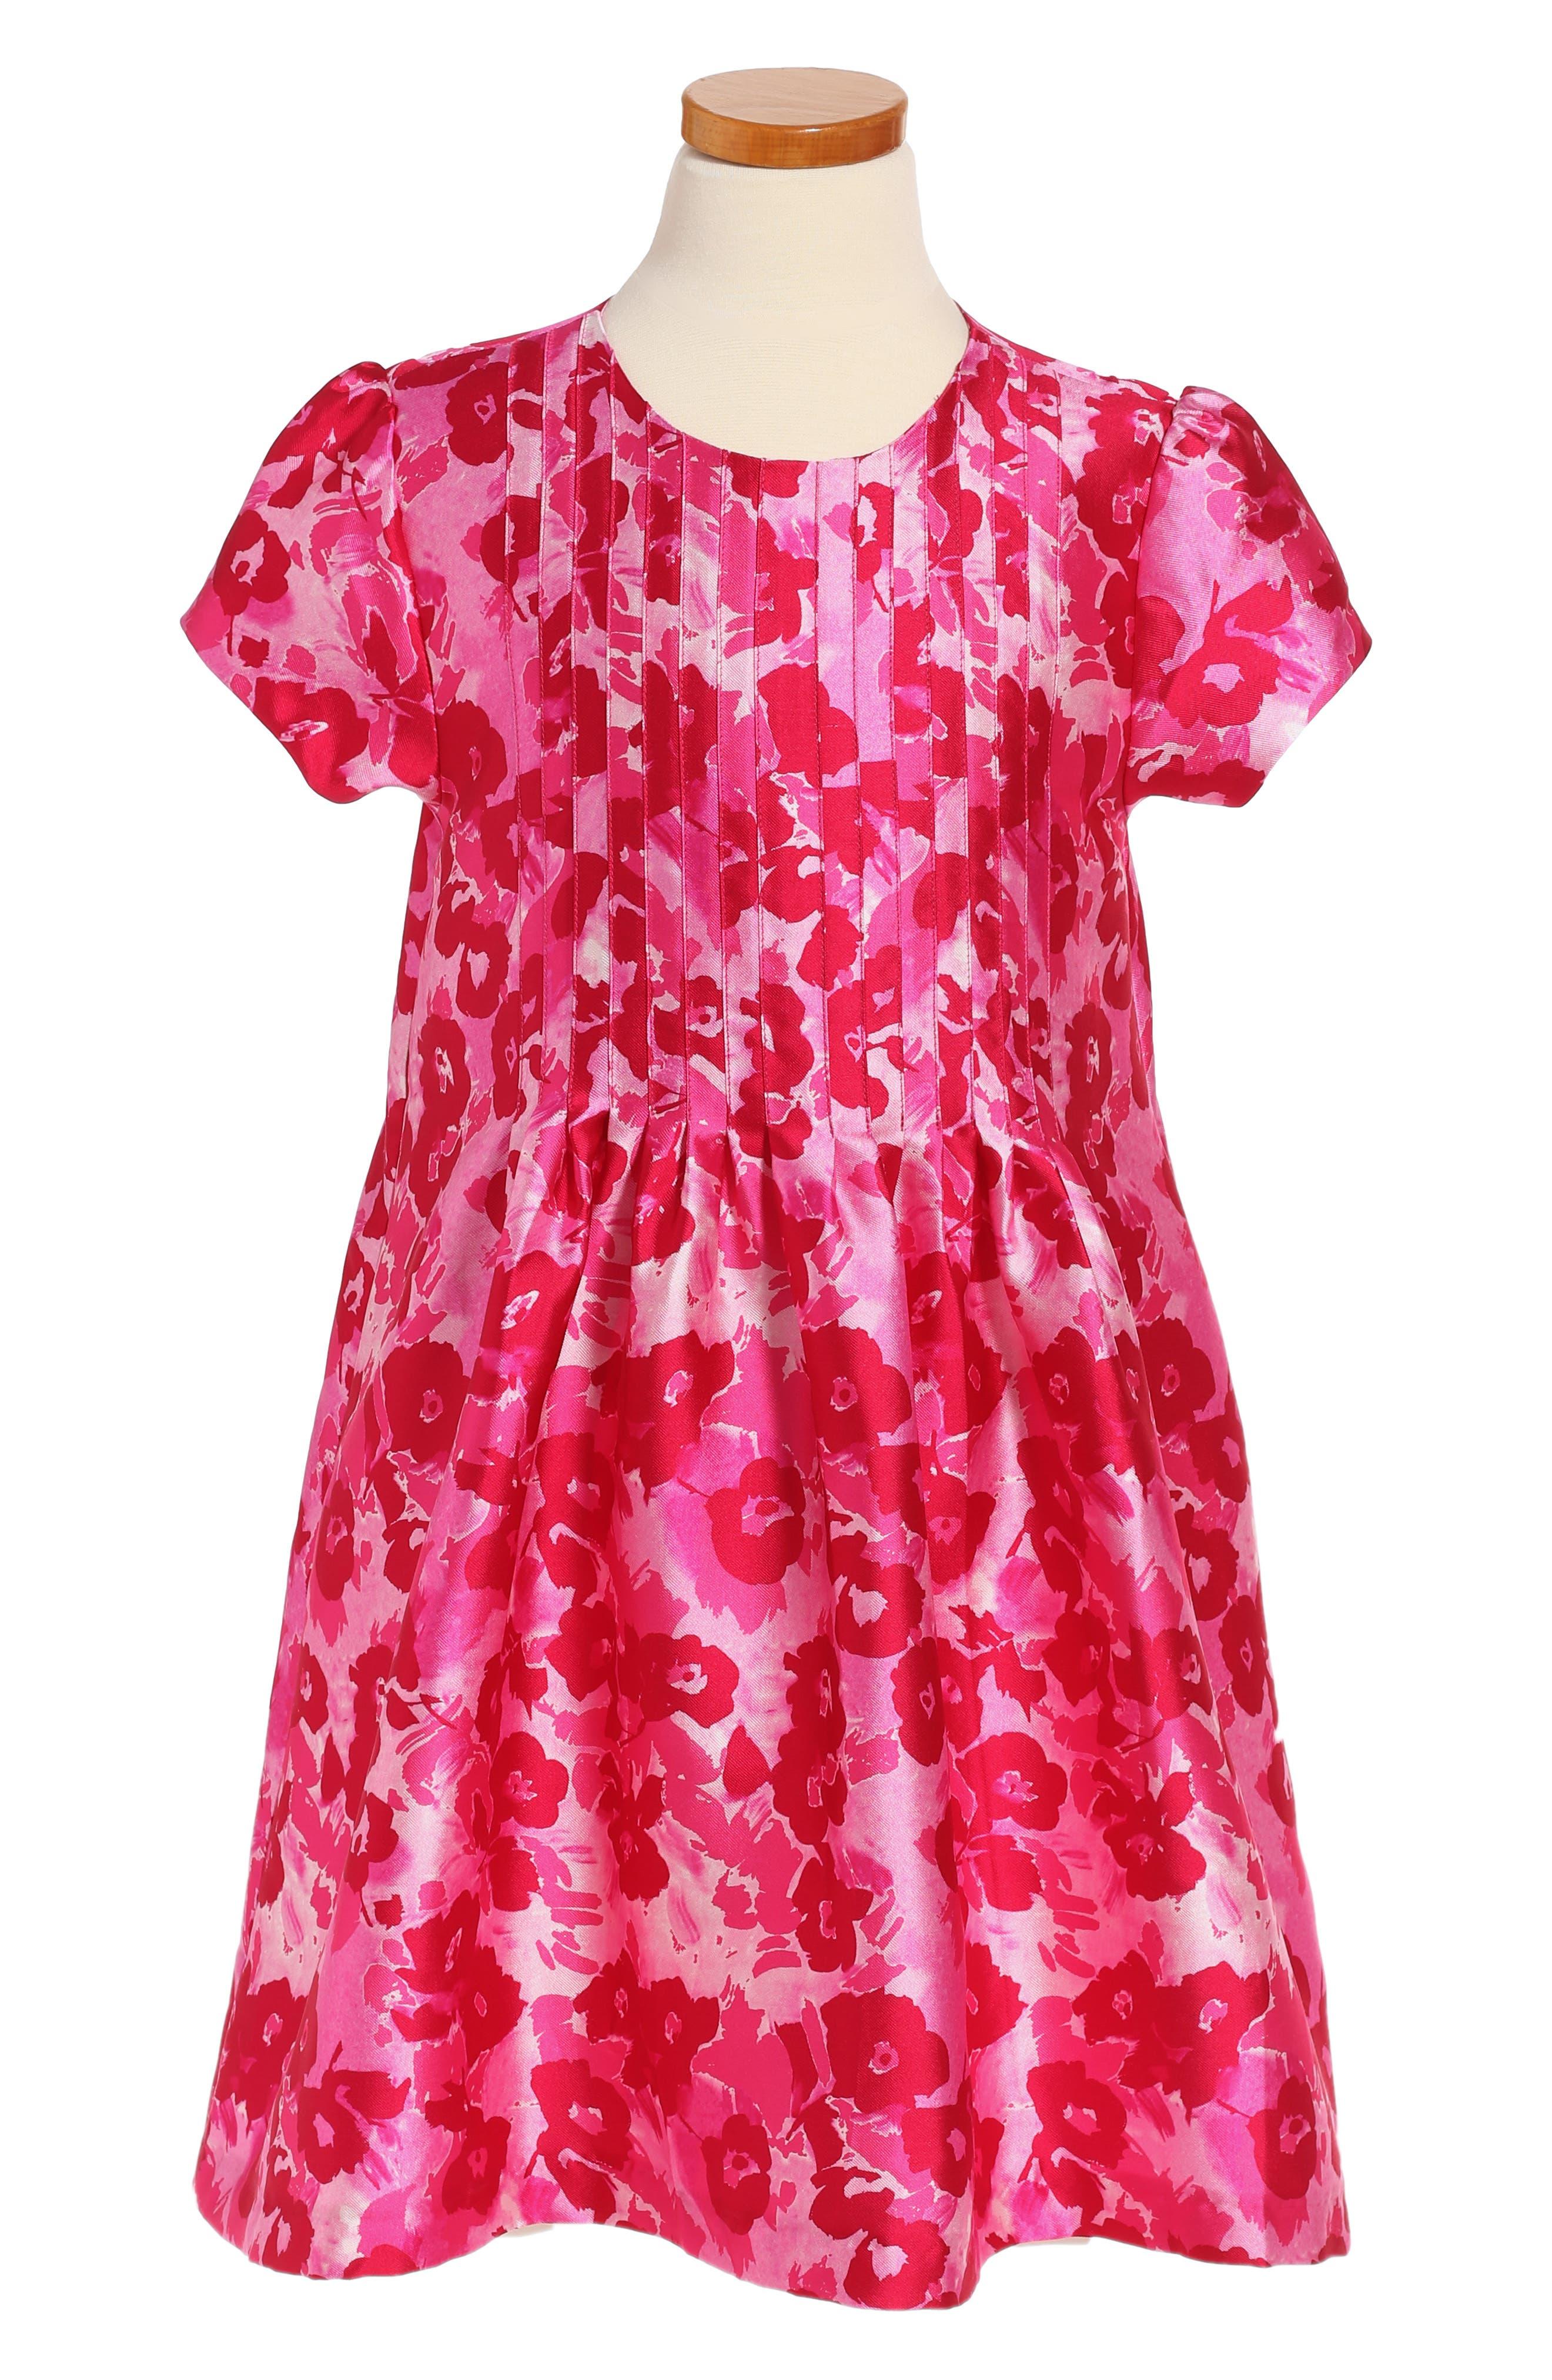 Oscar de la Renta Wild Roses Mikado Dress (Big Girls)